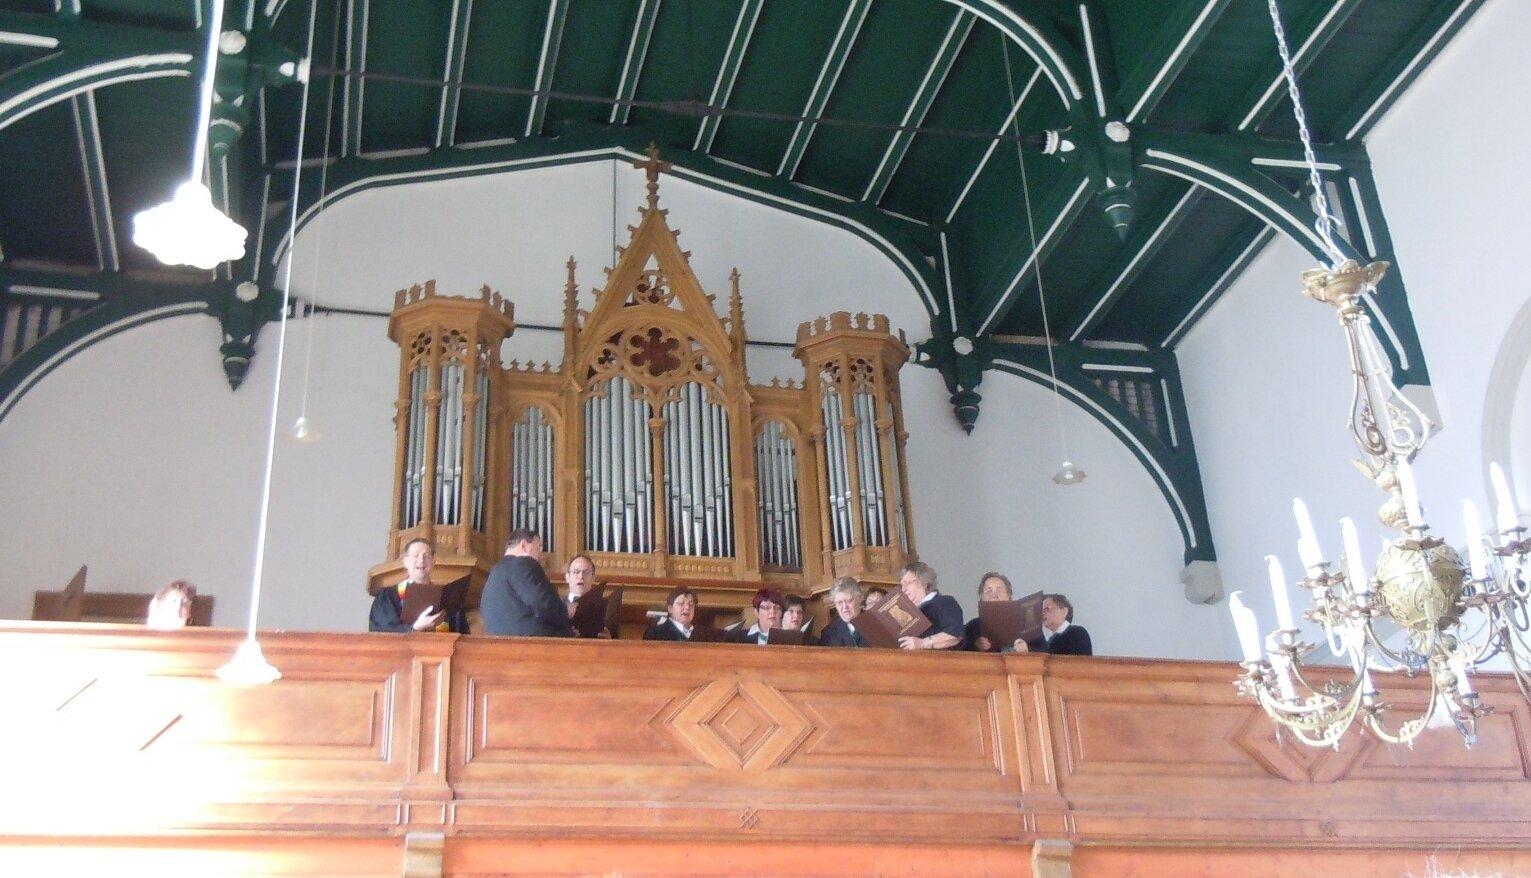 Orgel Hinsdorf